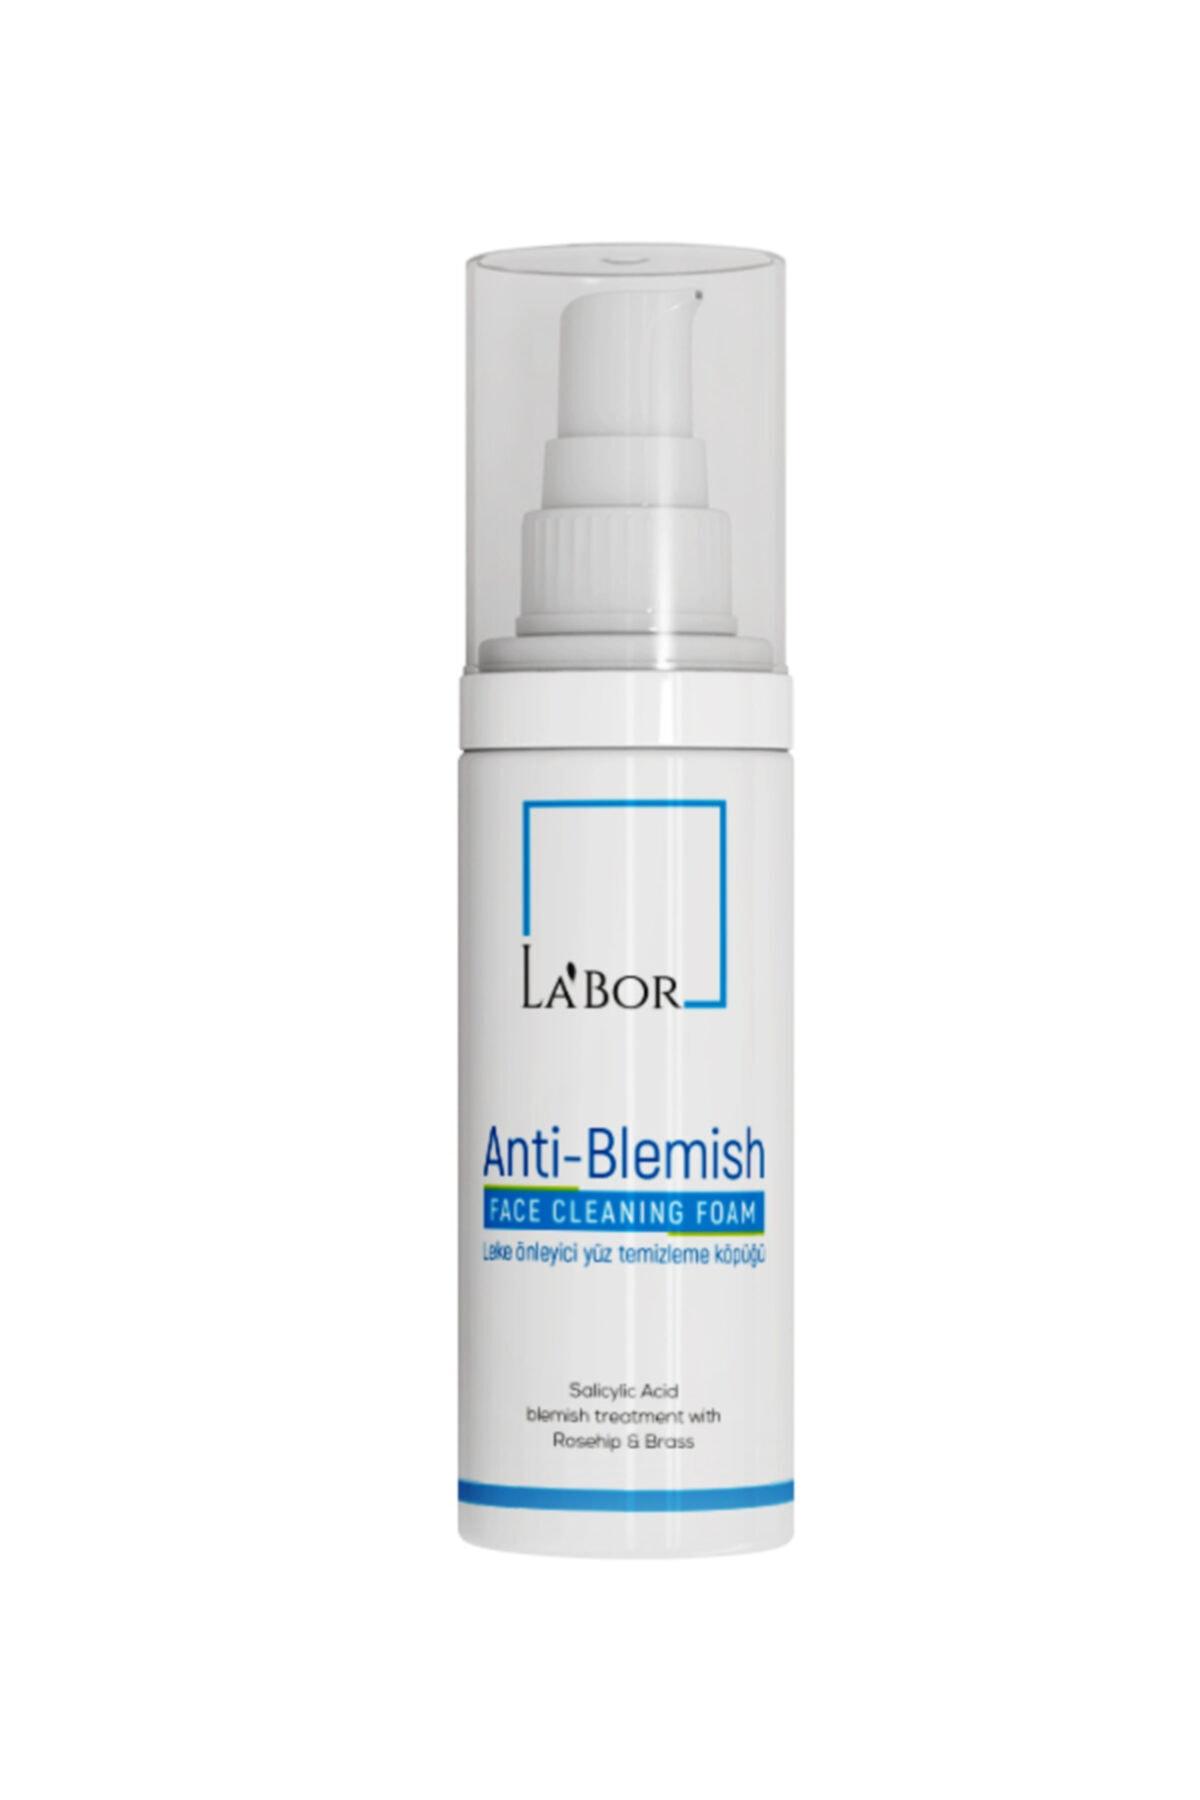 LABOR Anti-blemish Yüz Temizleme Köpüğü 150 ml 1